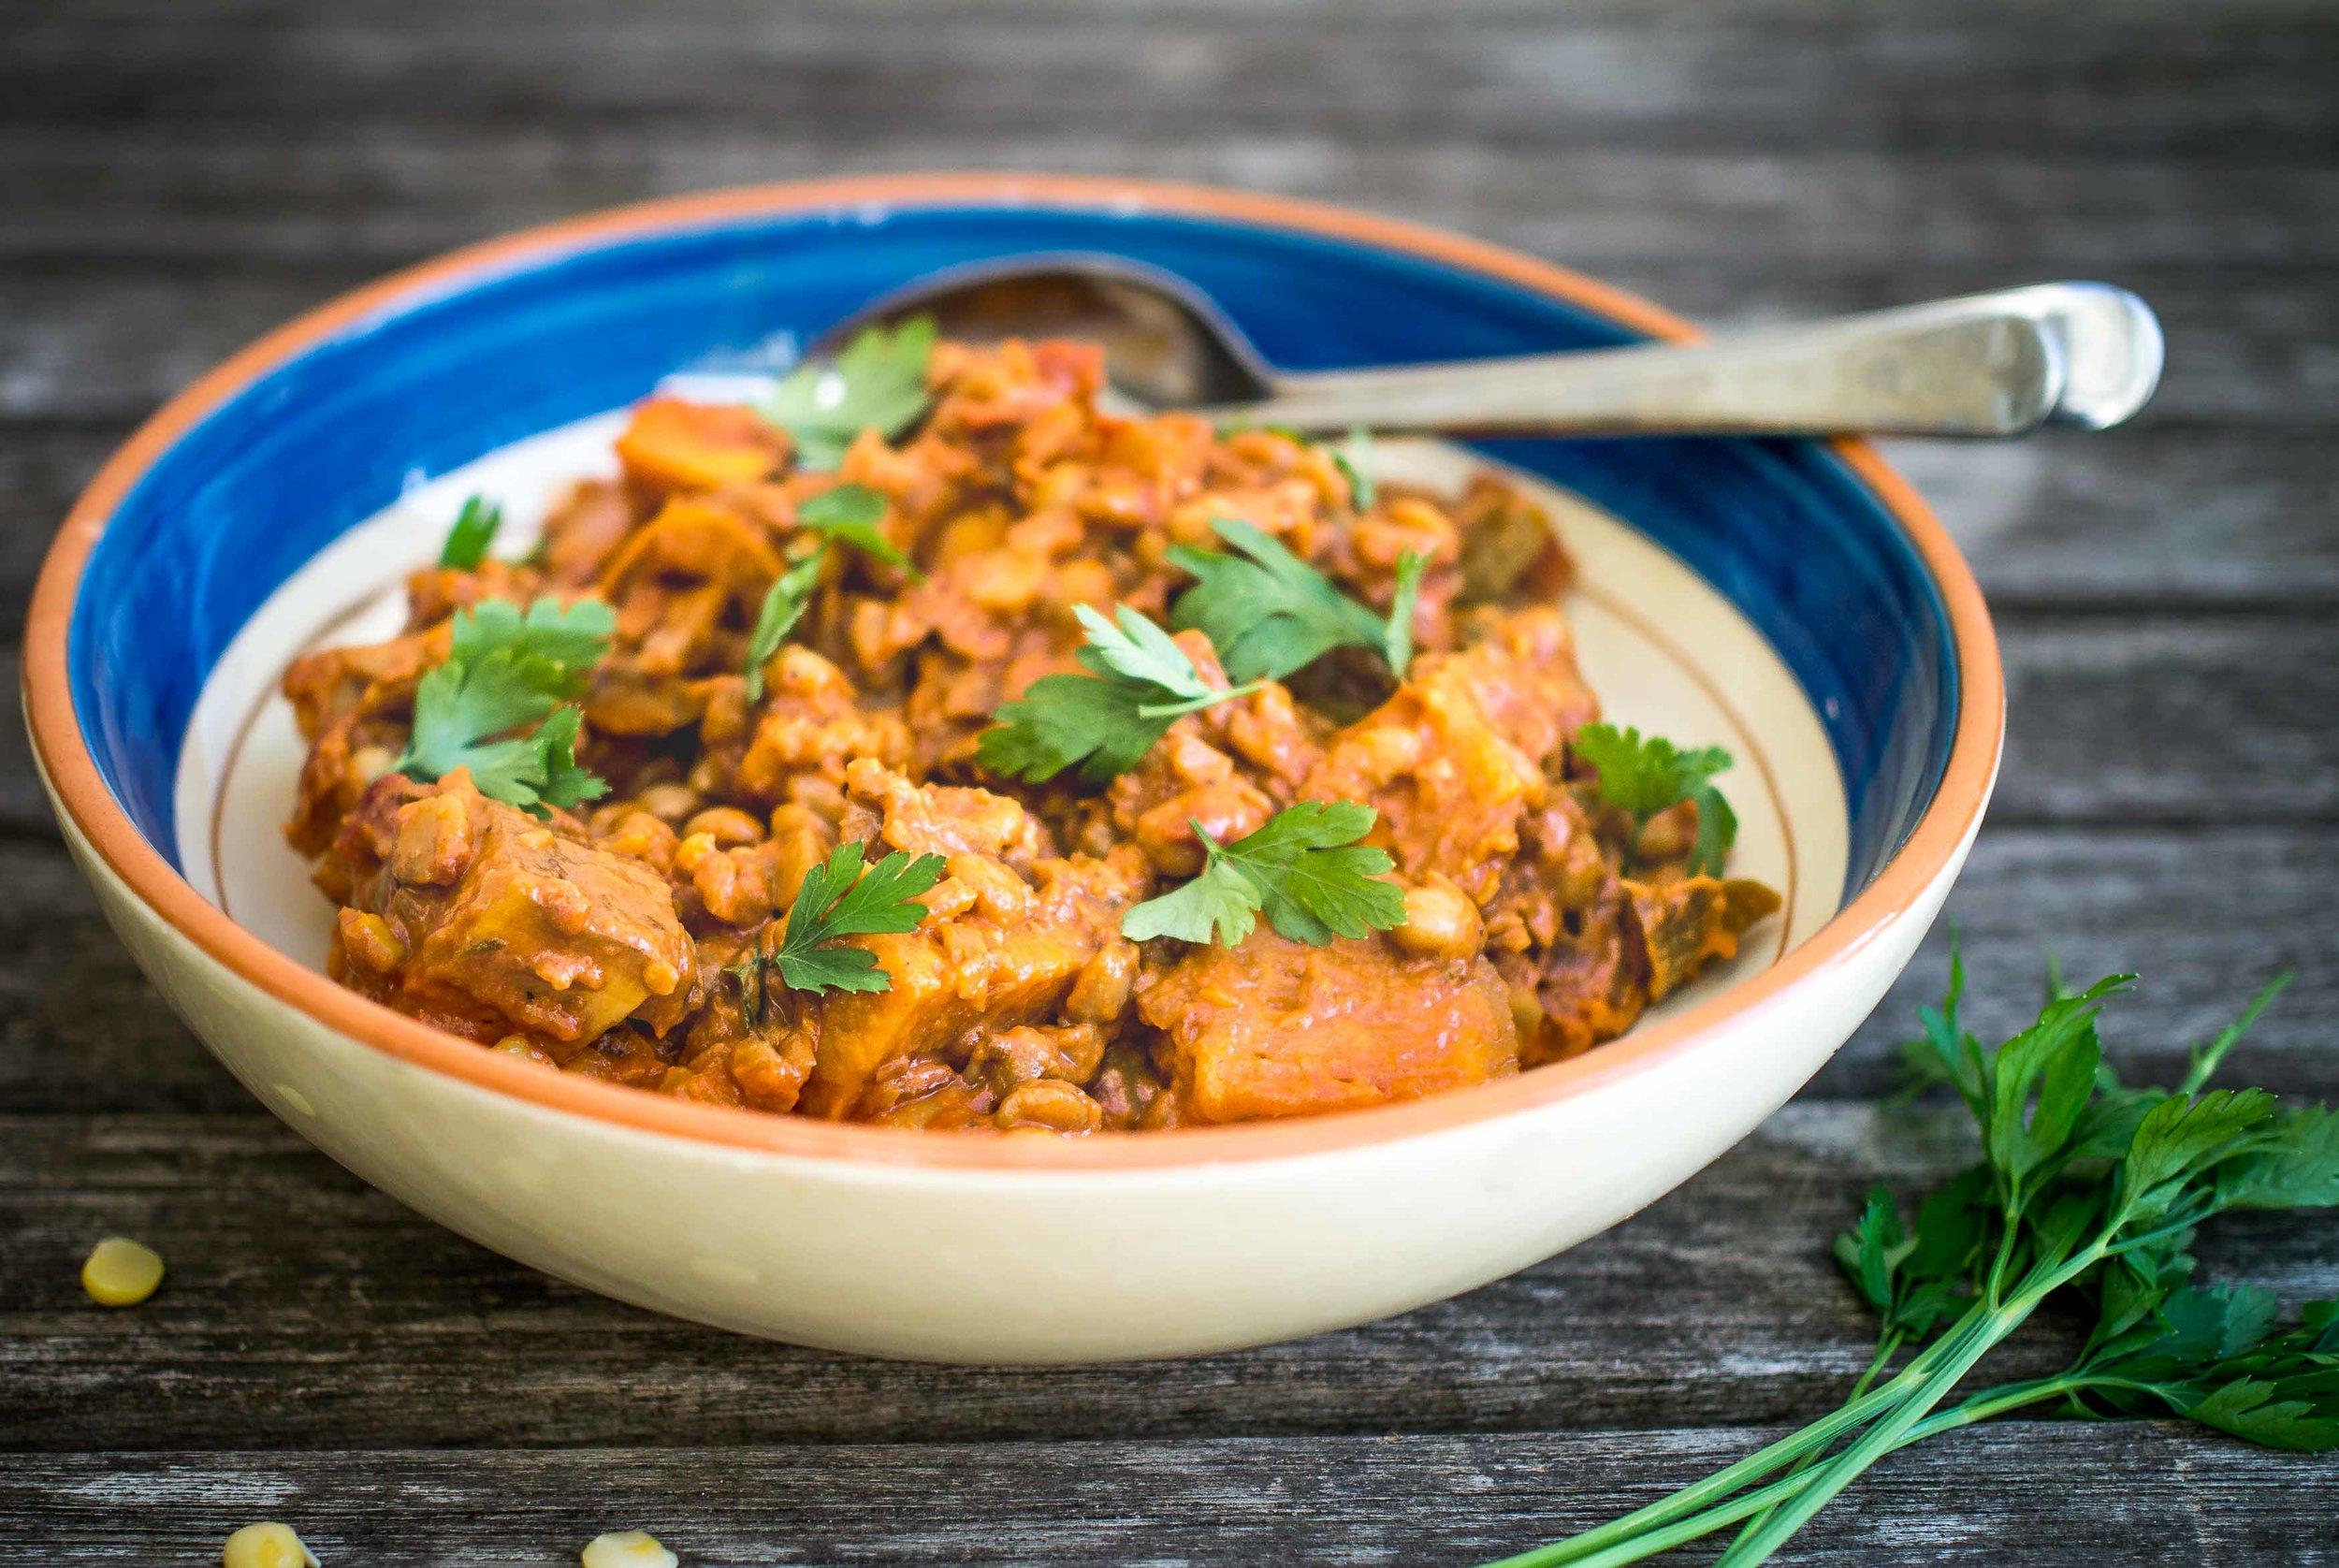 Cajun Split Pea and Sweet Potato Stew | Discover Delicious | www.discoverdelicious.org | Vegan Food Blog